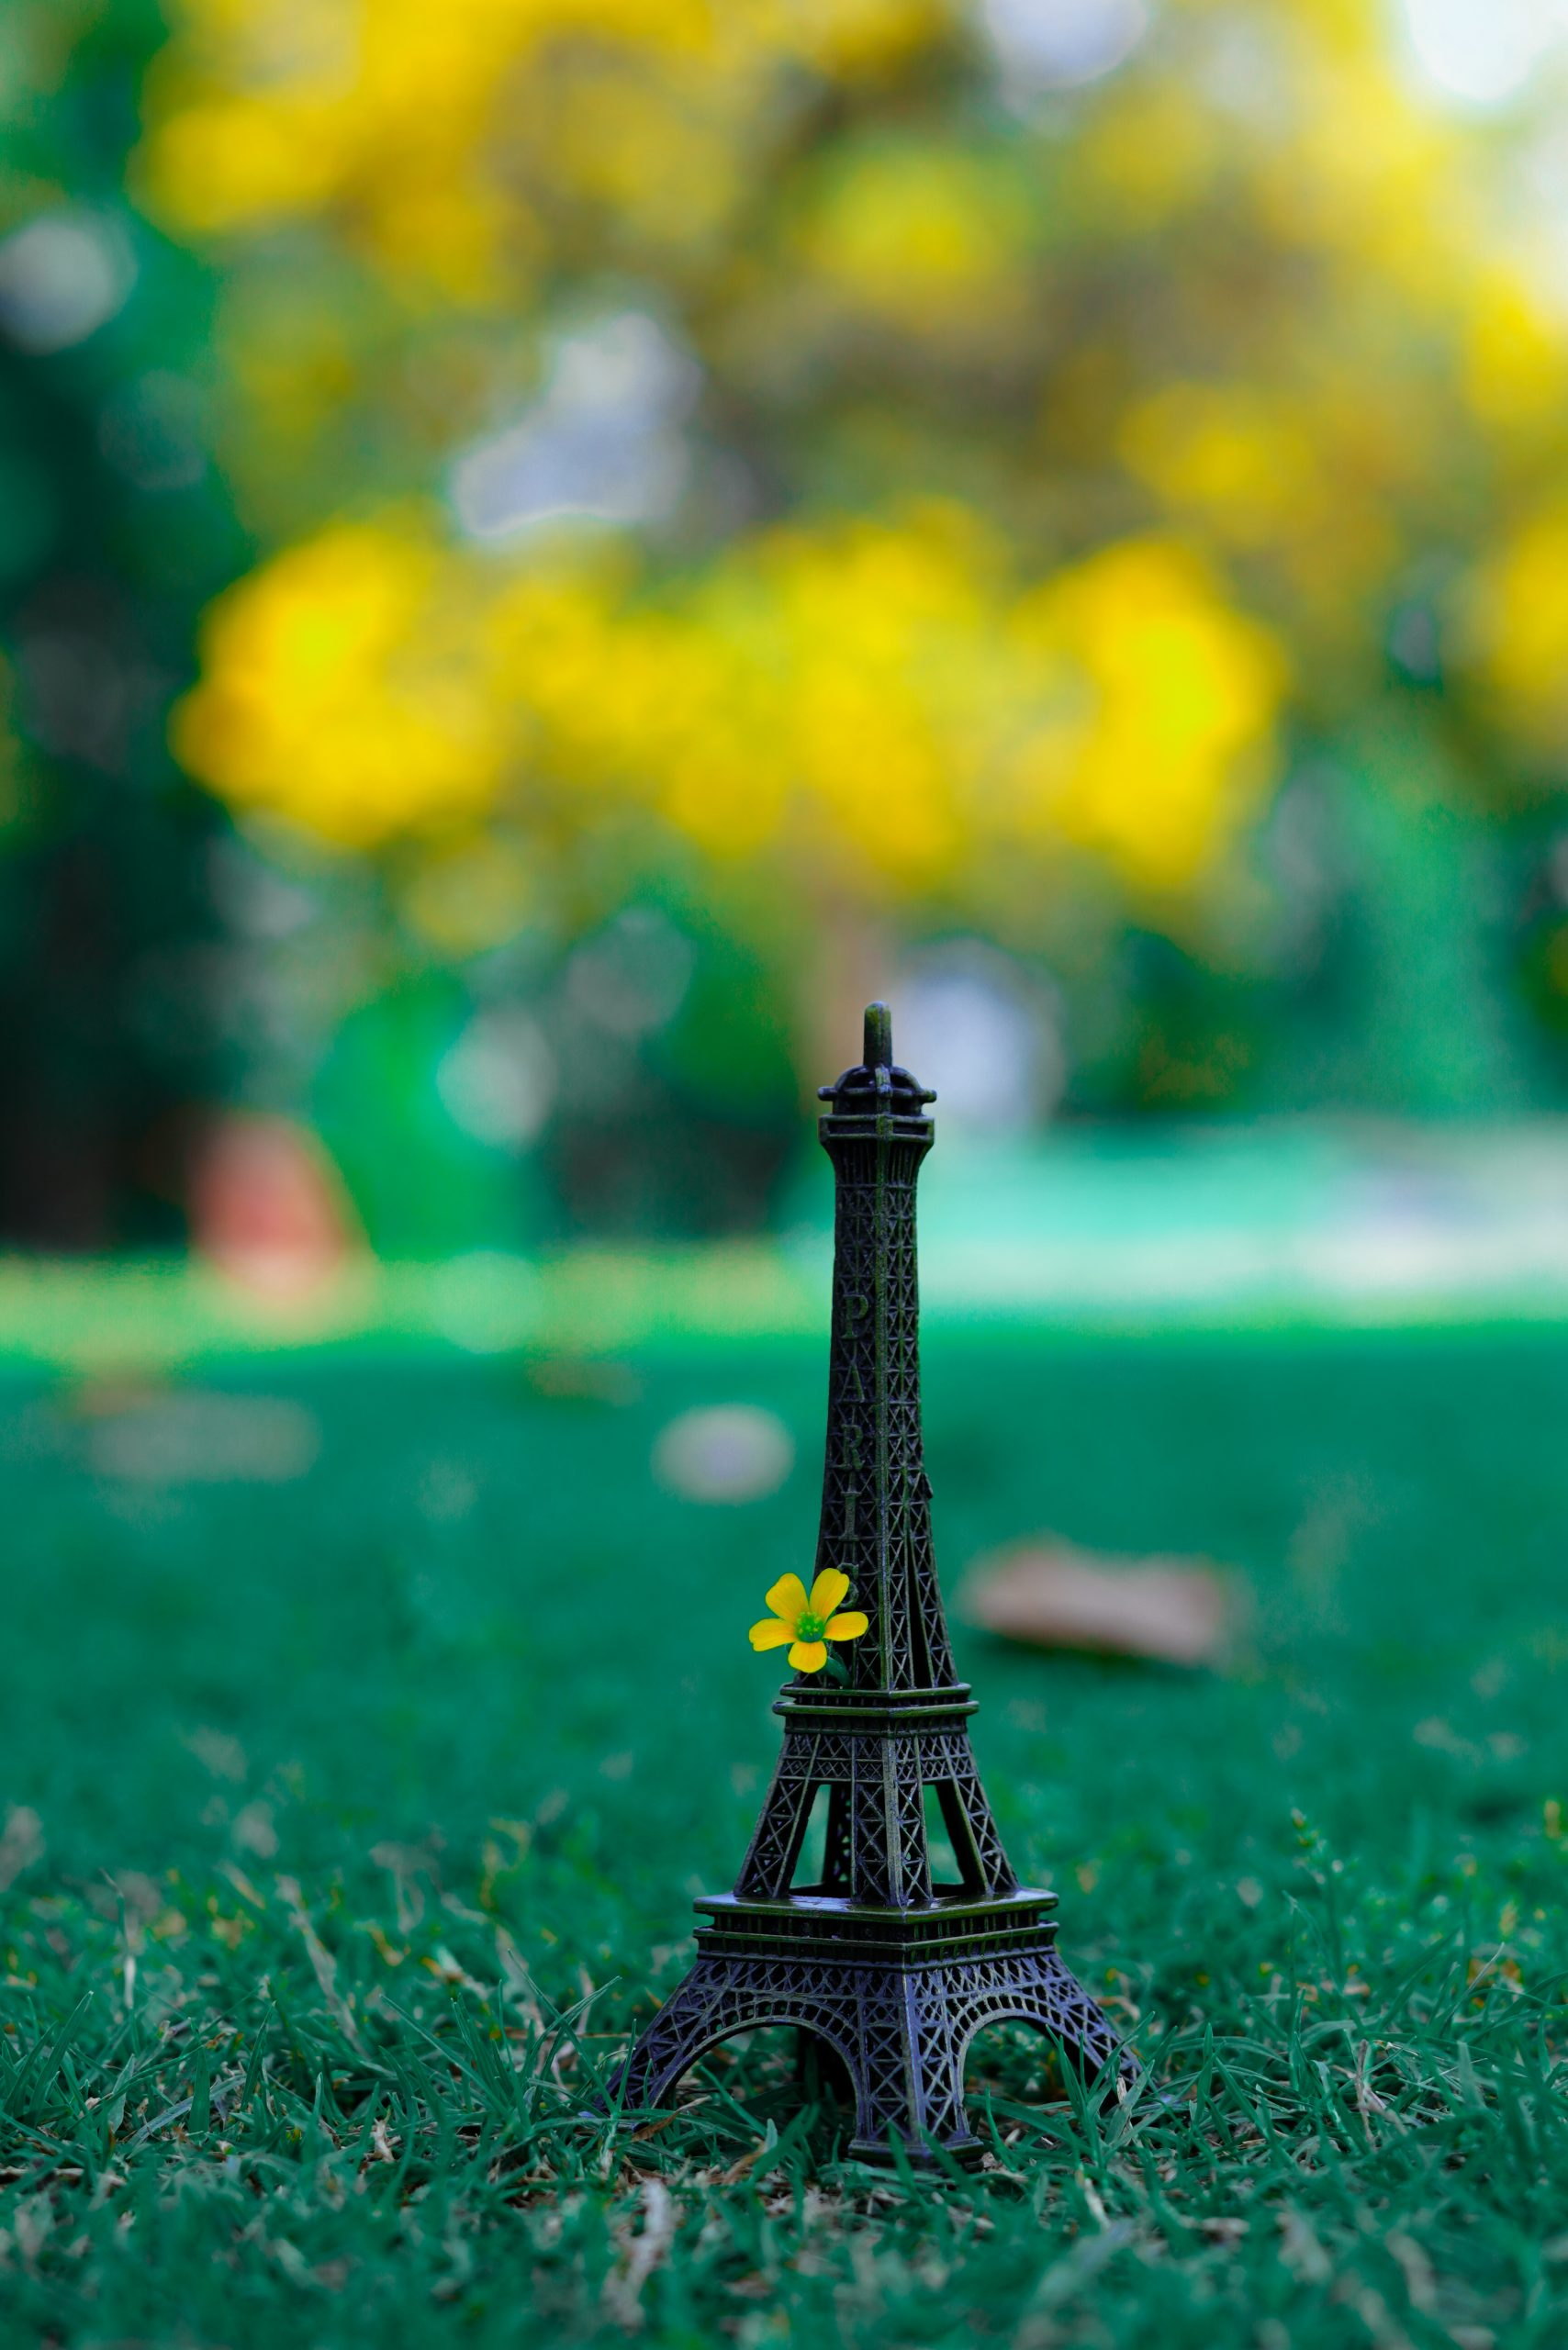 Prototype of Eiffel tower